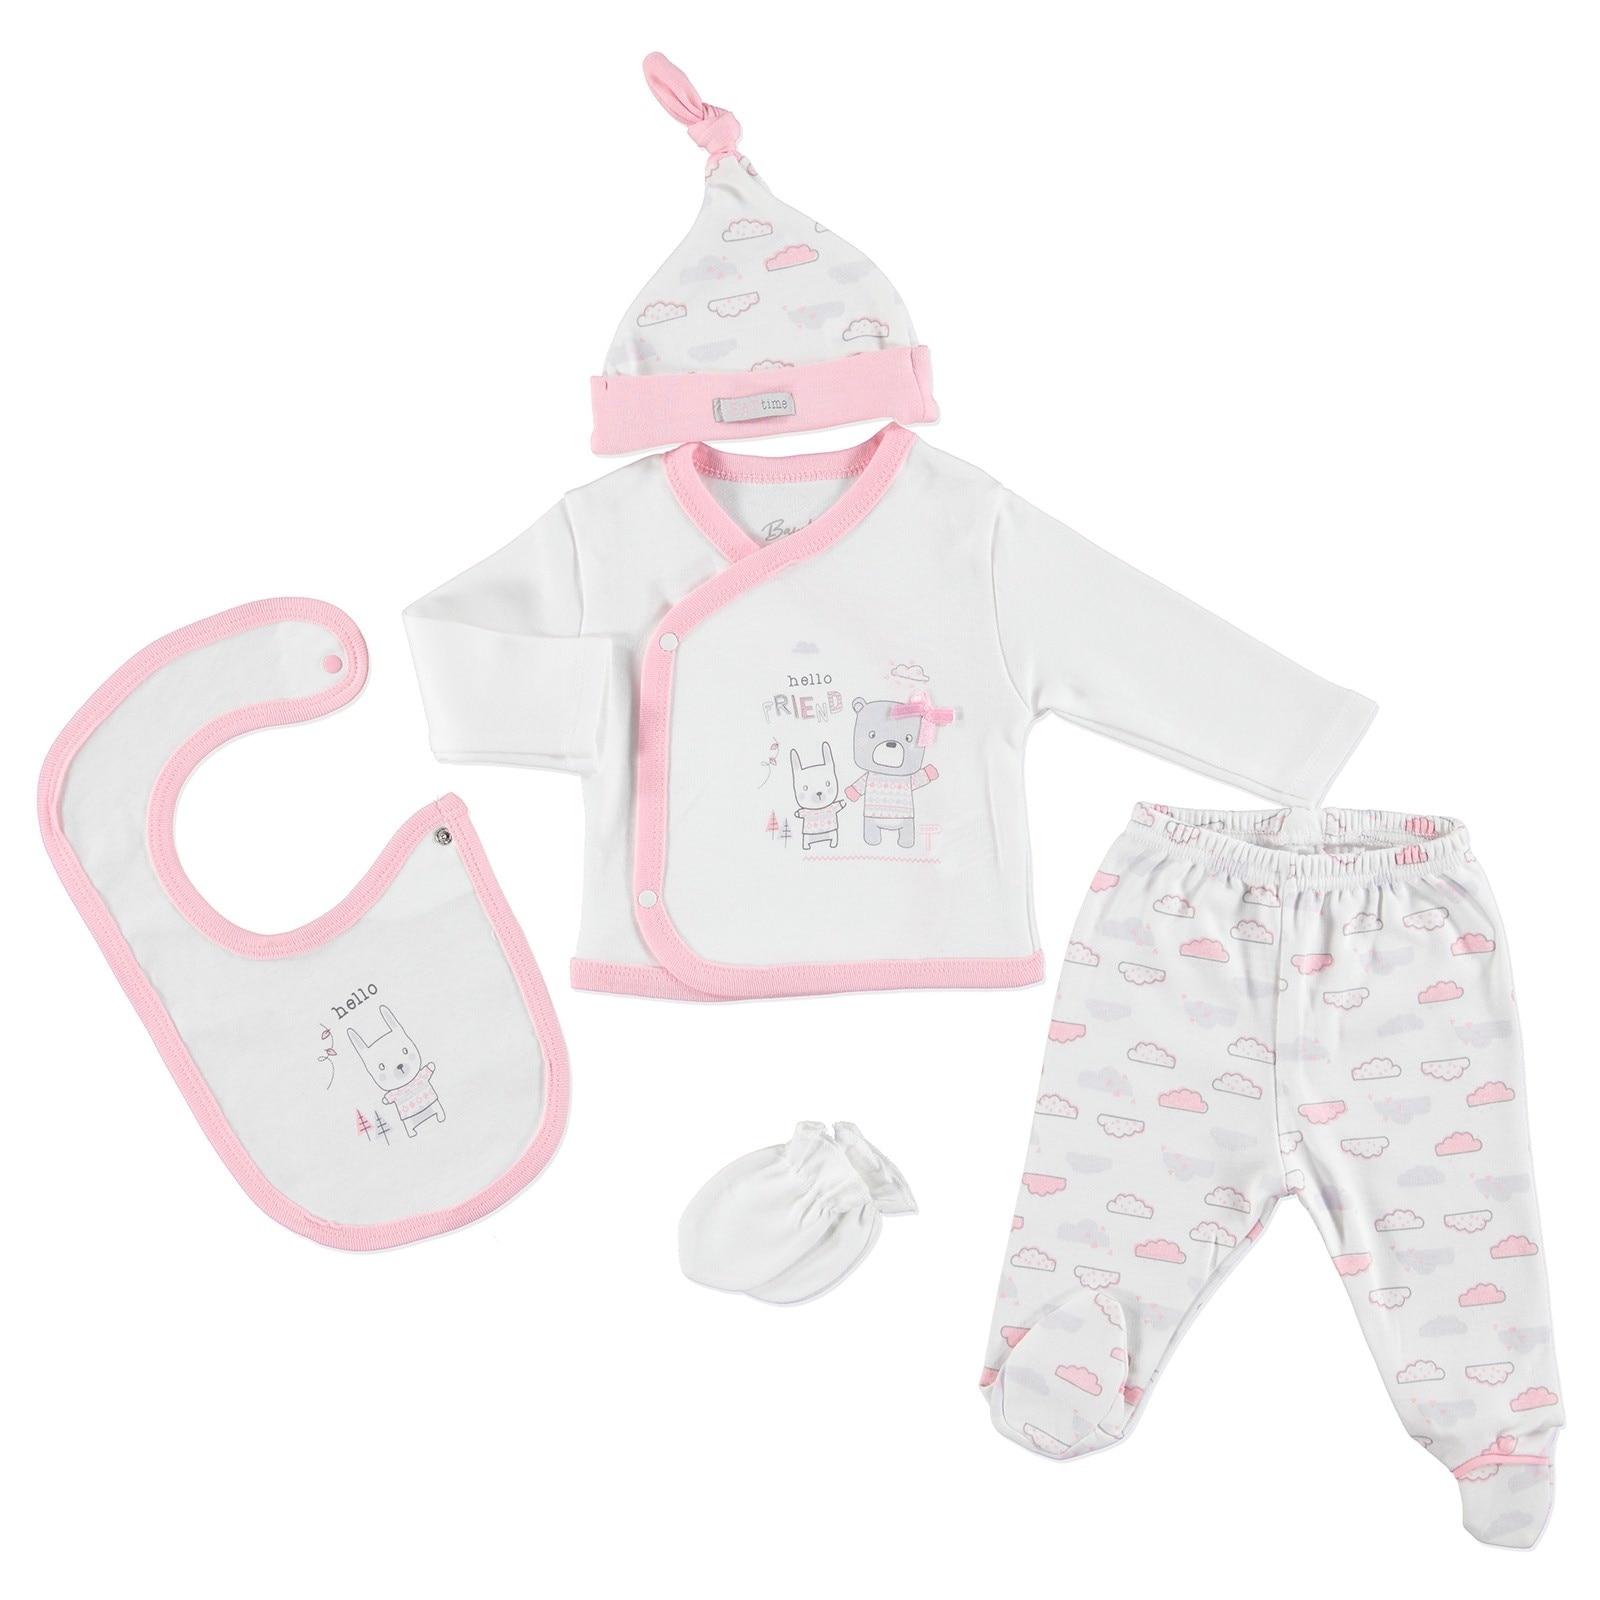 Ebebek Bambaki Cloud Baby Girl Newborn Hospital Pack 5 Pcs